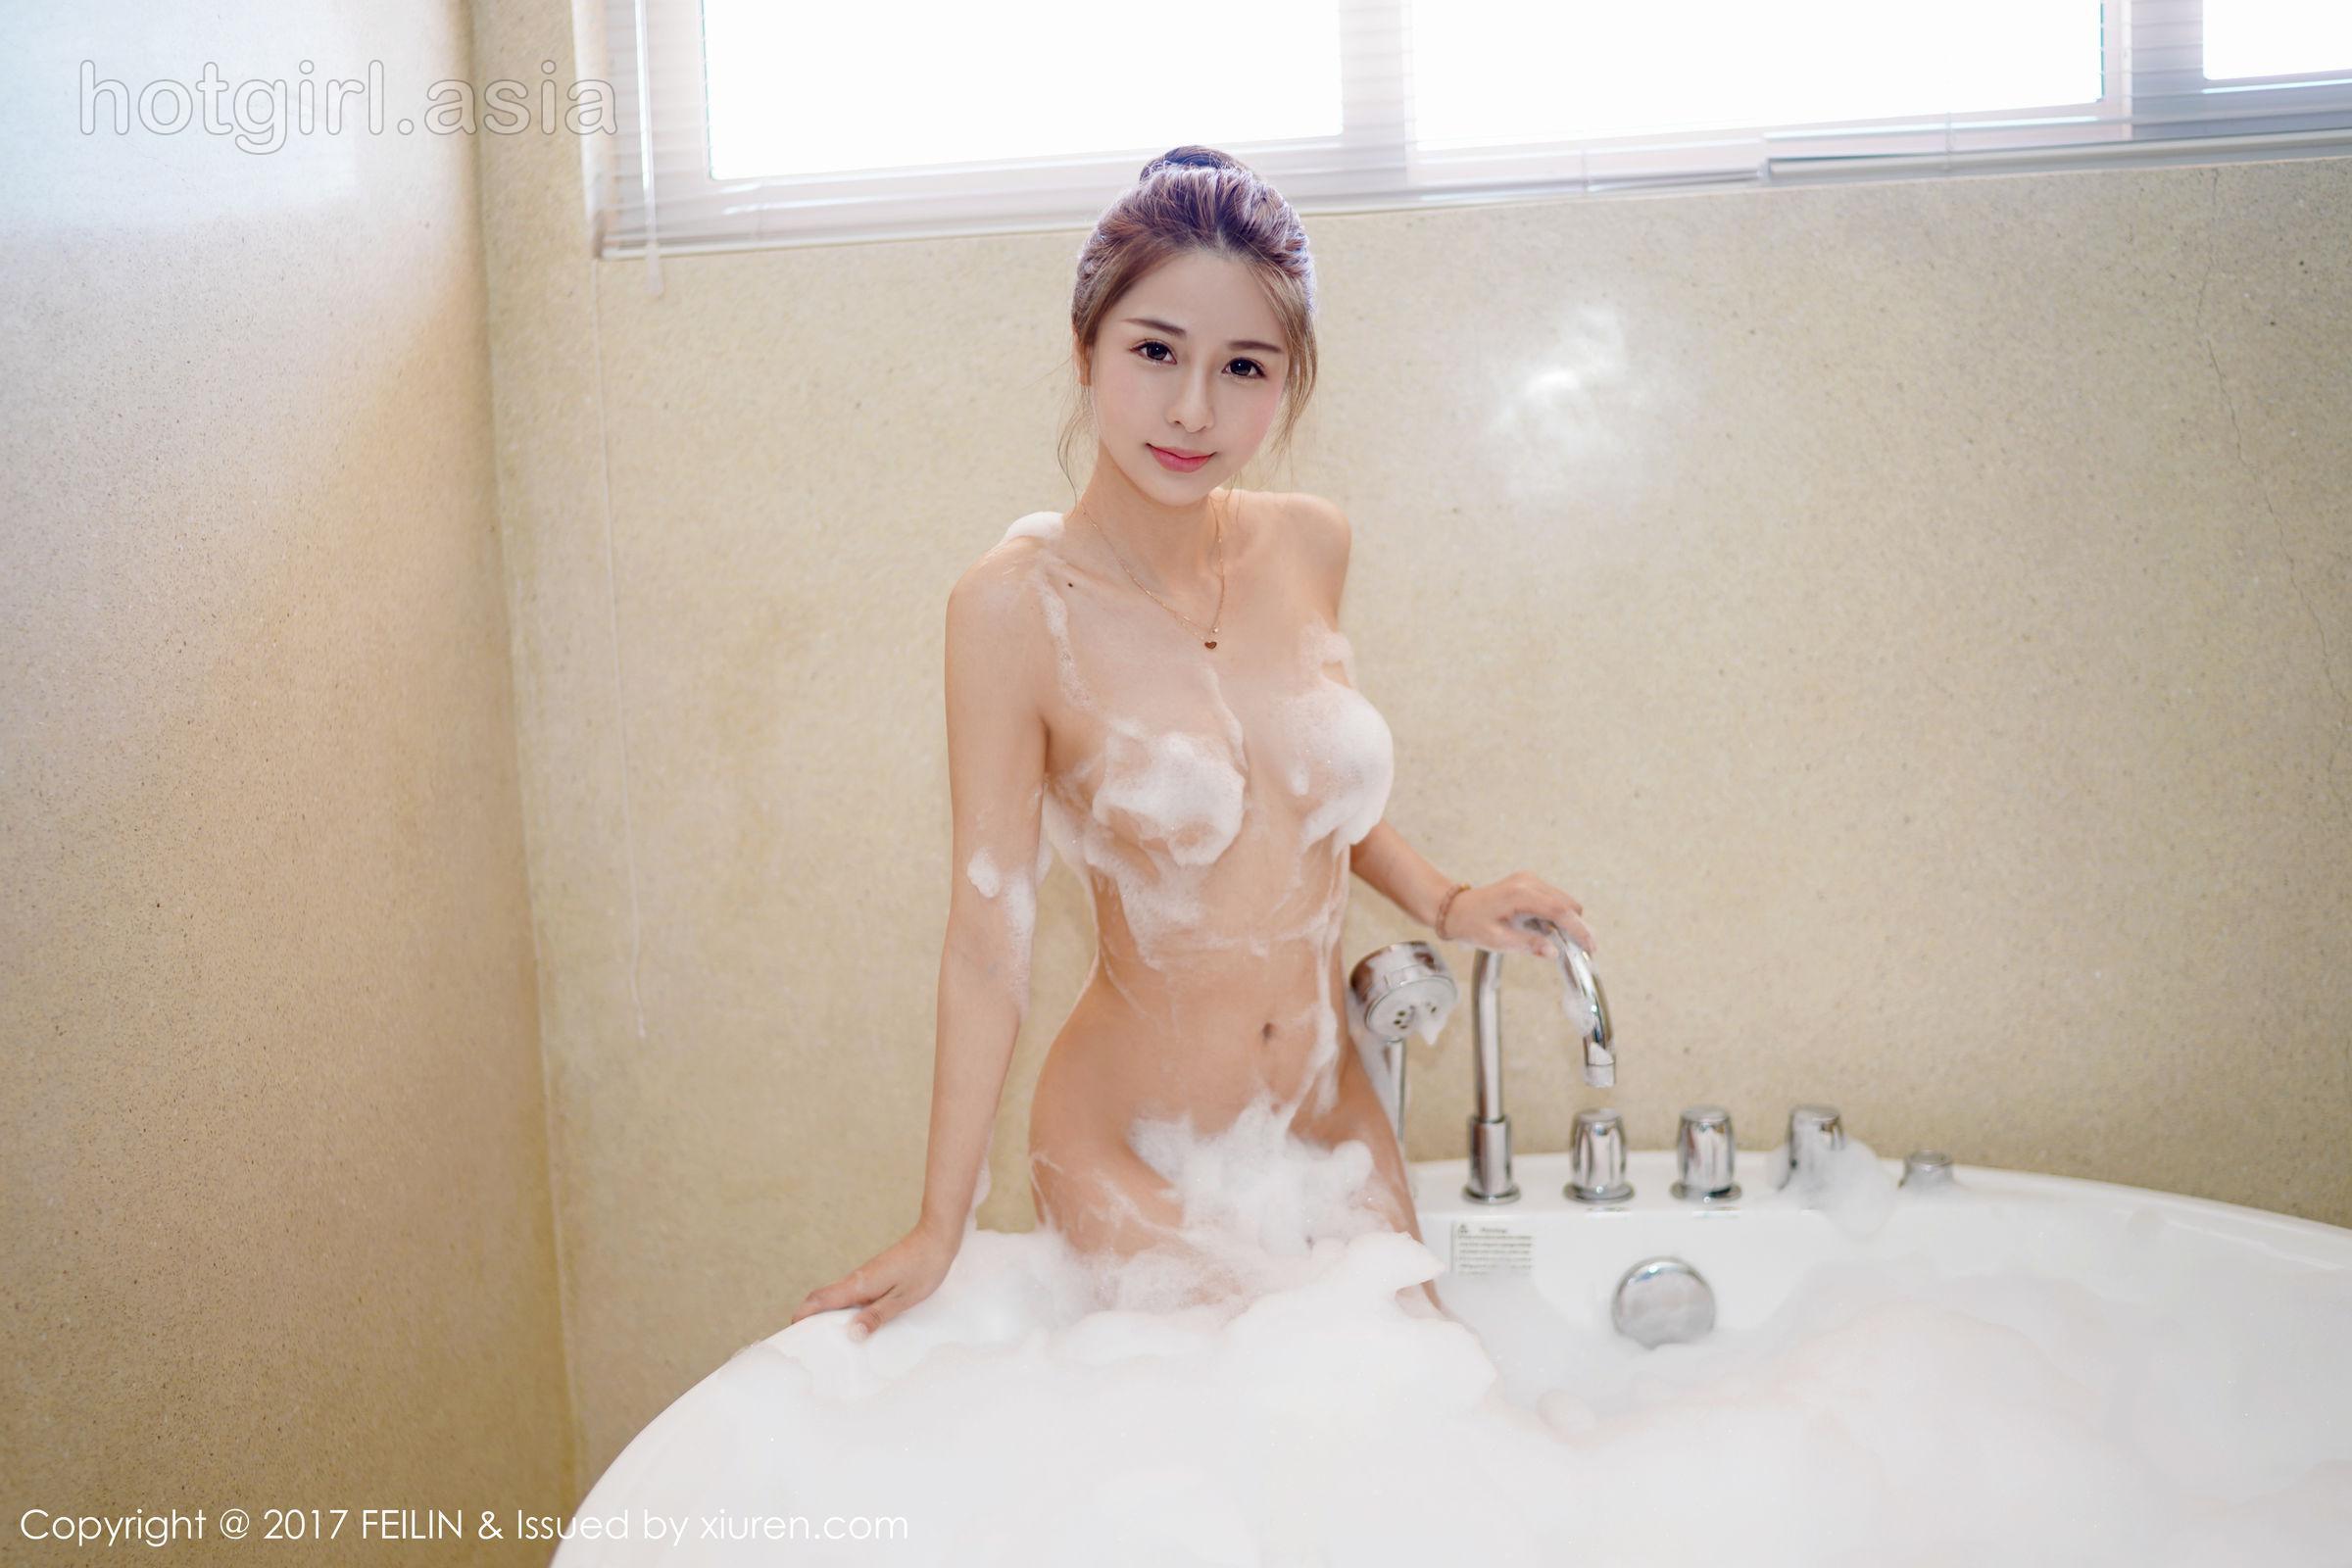 [FEILIN 囲 囡囡] VOL.114 luna 张静燕-Model @luna 张静燕 Third set of photos